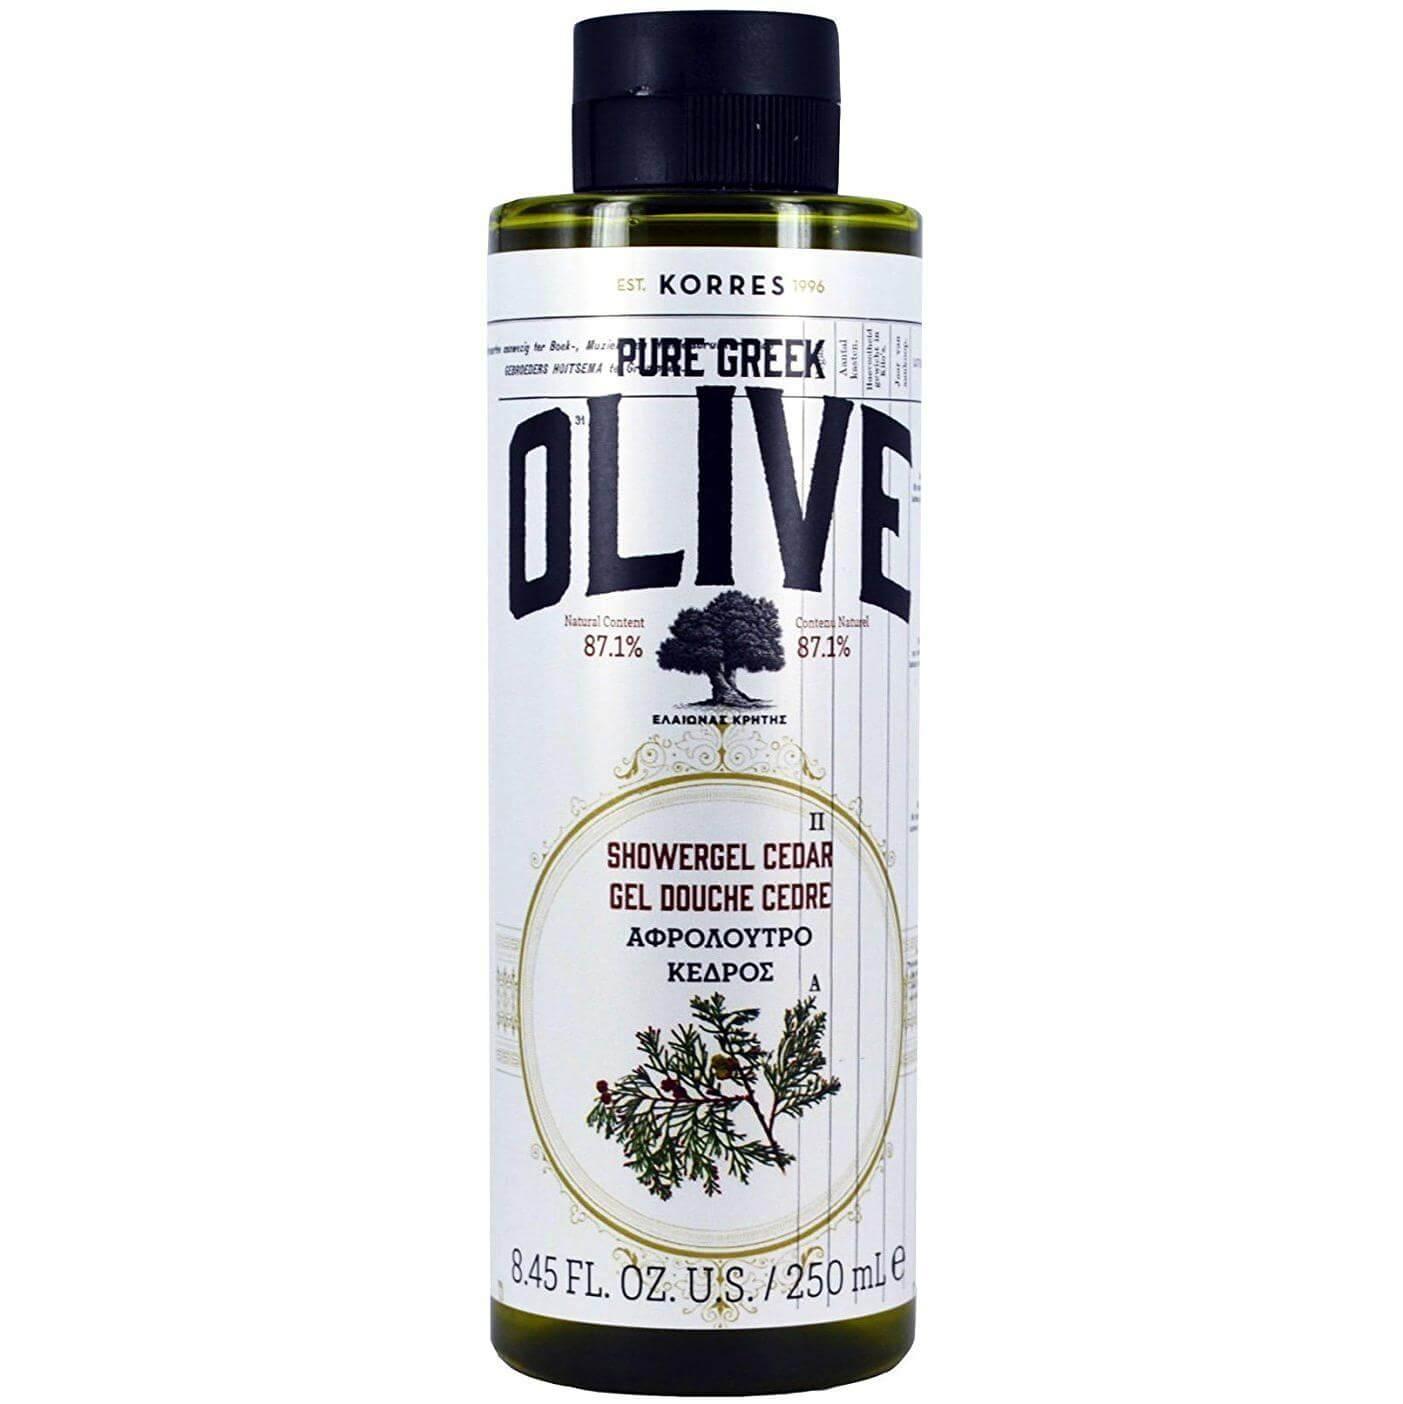 Korres Pure Greek Olive Shower Gel Cedar Αφρόλουτρο με Εκχύλισμα Φύλλων Βιολογικής Ελιάς & Άρωμα Κέδρου 250ml